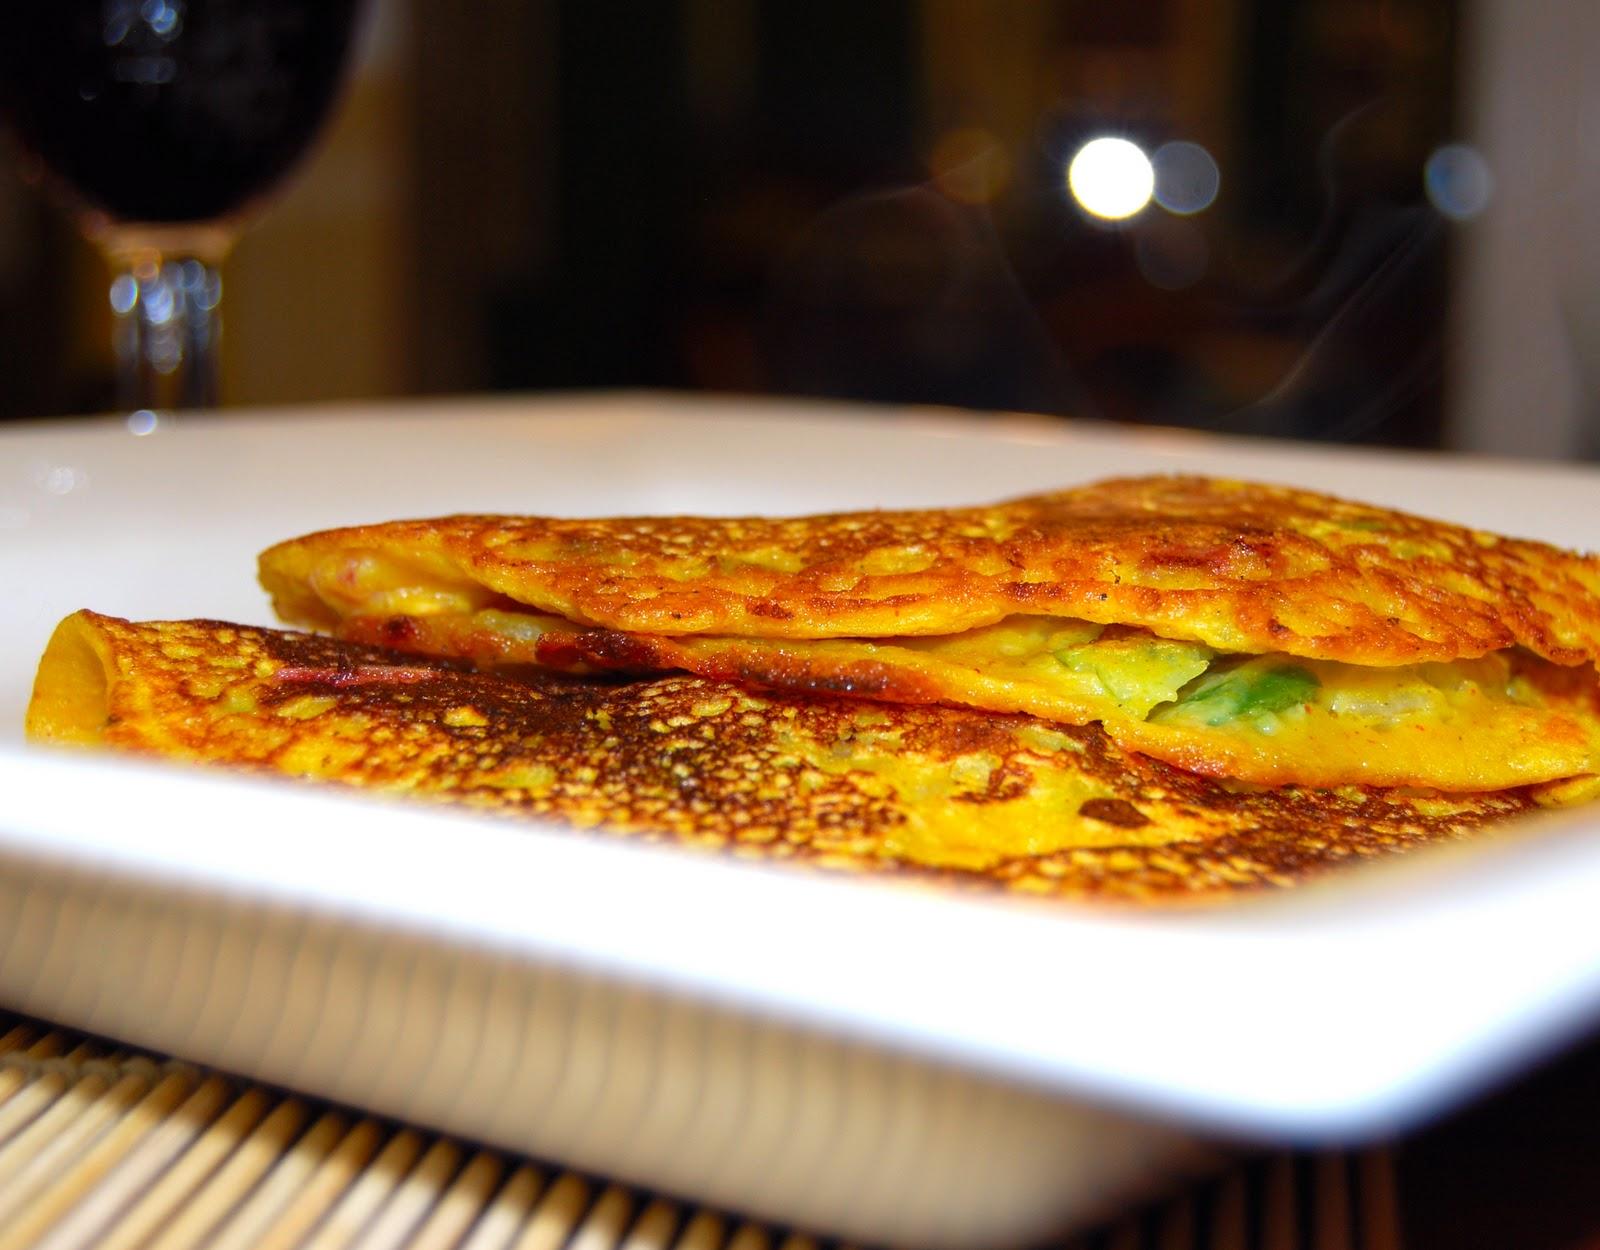 Eggless Vegetable Omelet Recipe | Besan Cheela - Holy Cow!